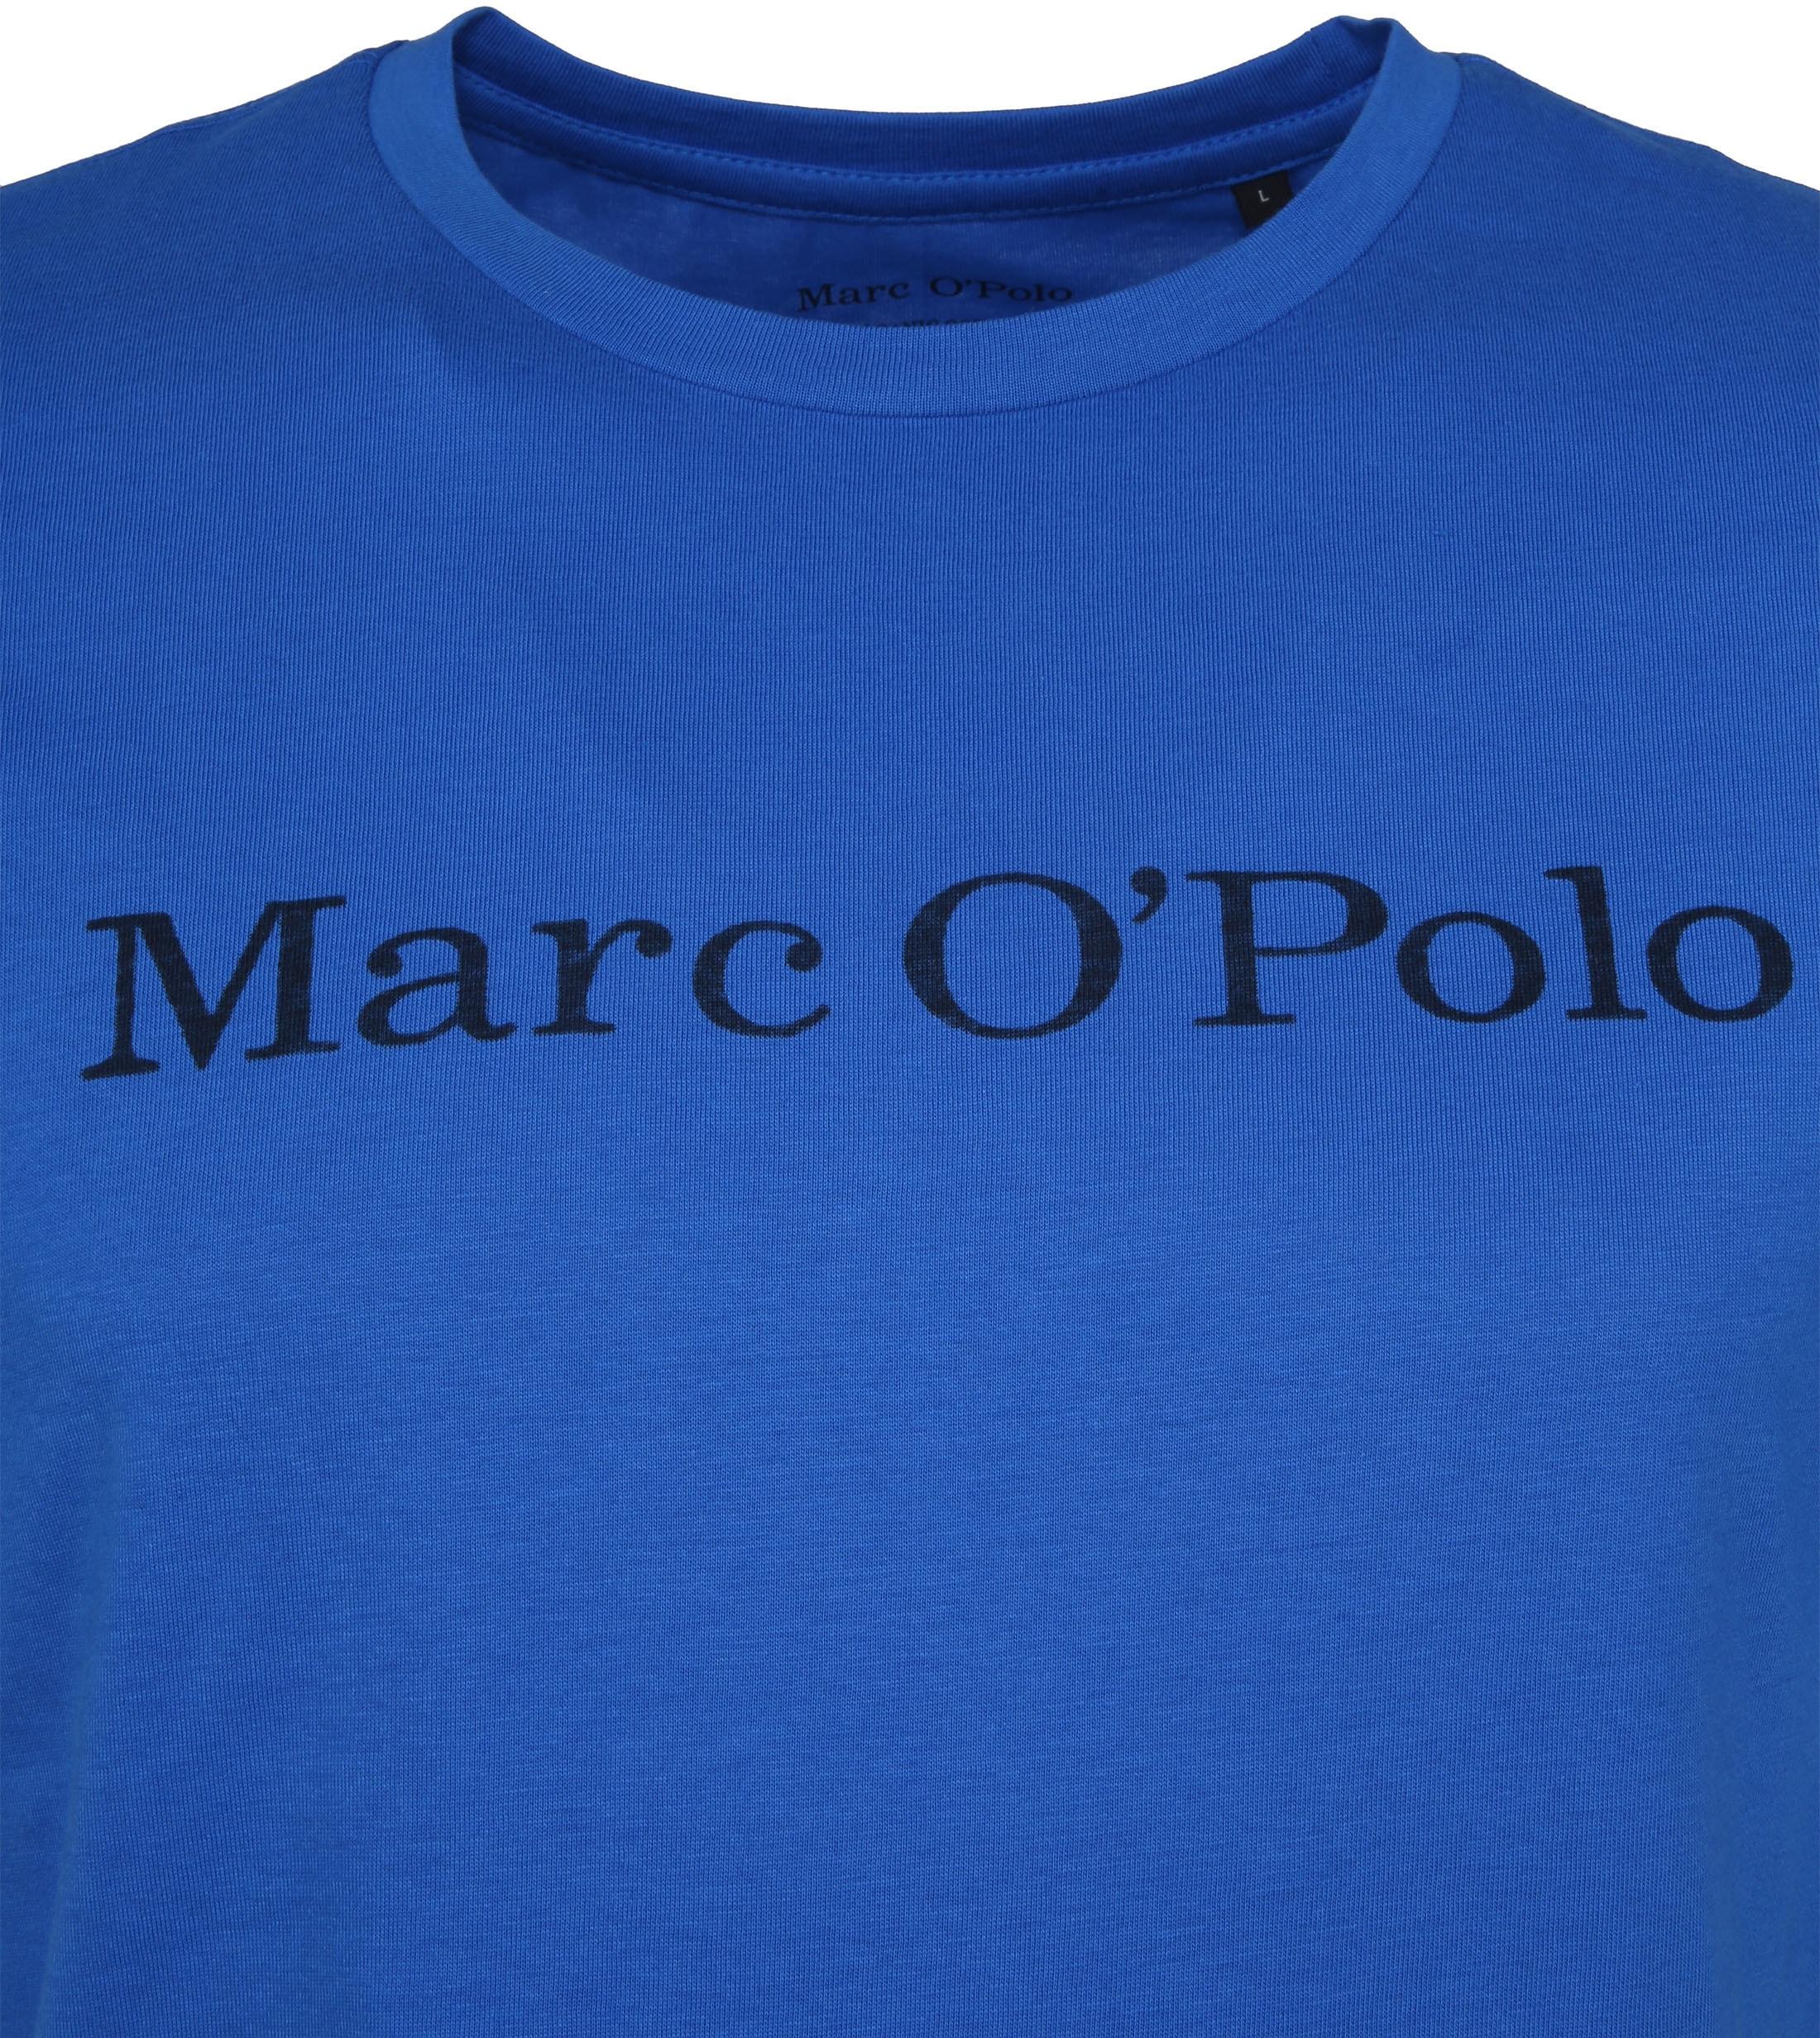 Marc O'Polo T-Shirt Victoria Blau foto 1